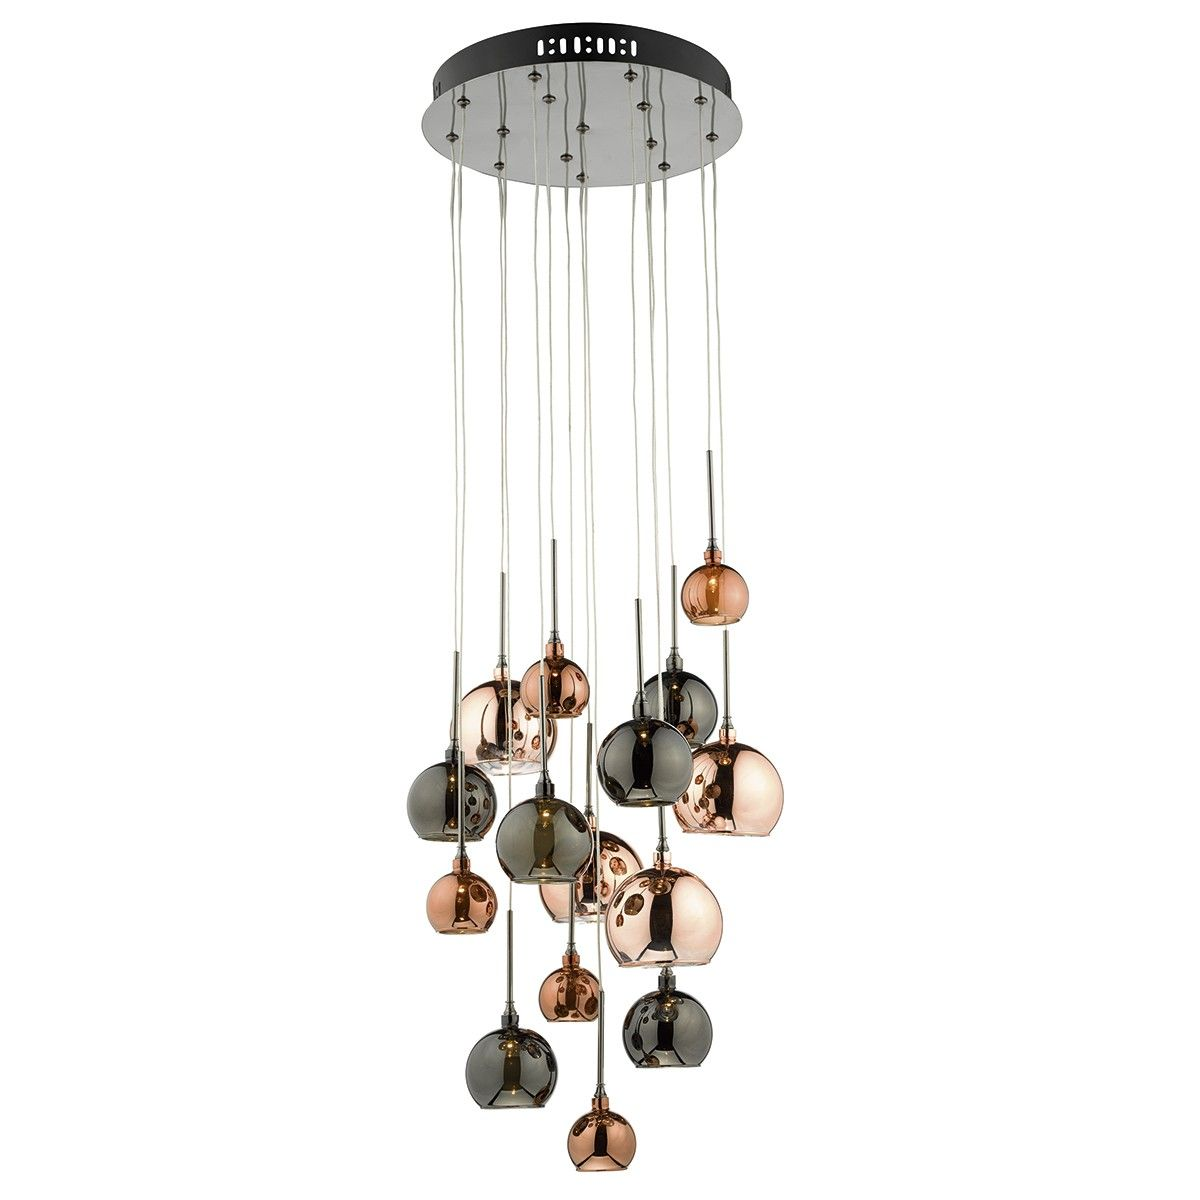 Aurelia 15 light g4 spiral pendant with copper dark copper aurelia 15 light g4 spiral pendant with copper dark copper bronze glass black arubaitofo Gallery